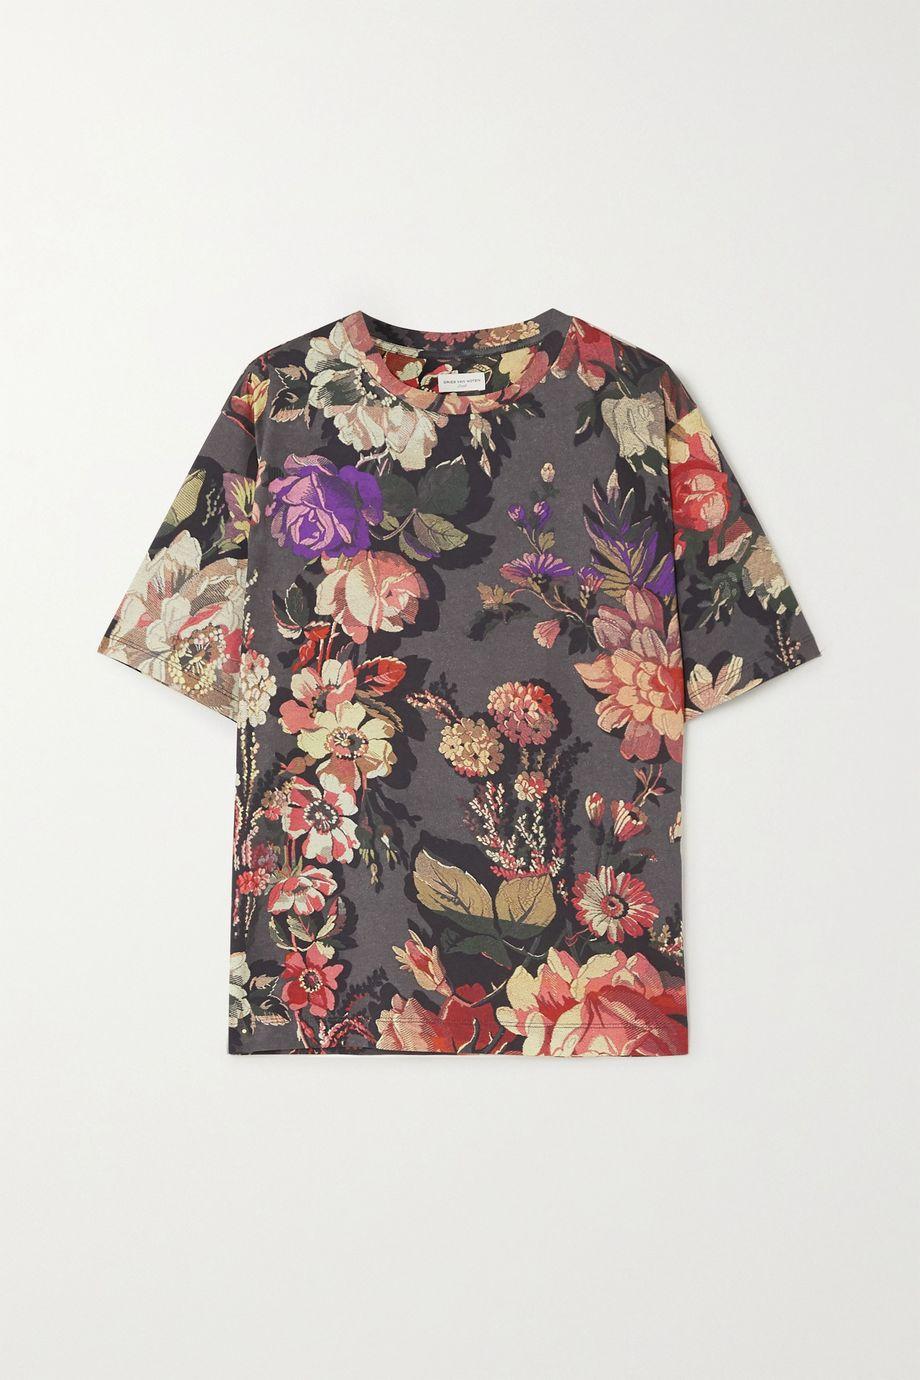 Dries Van Noten T-Shirt aus Baumwoll-Jersey mit Blumenprint